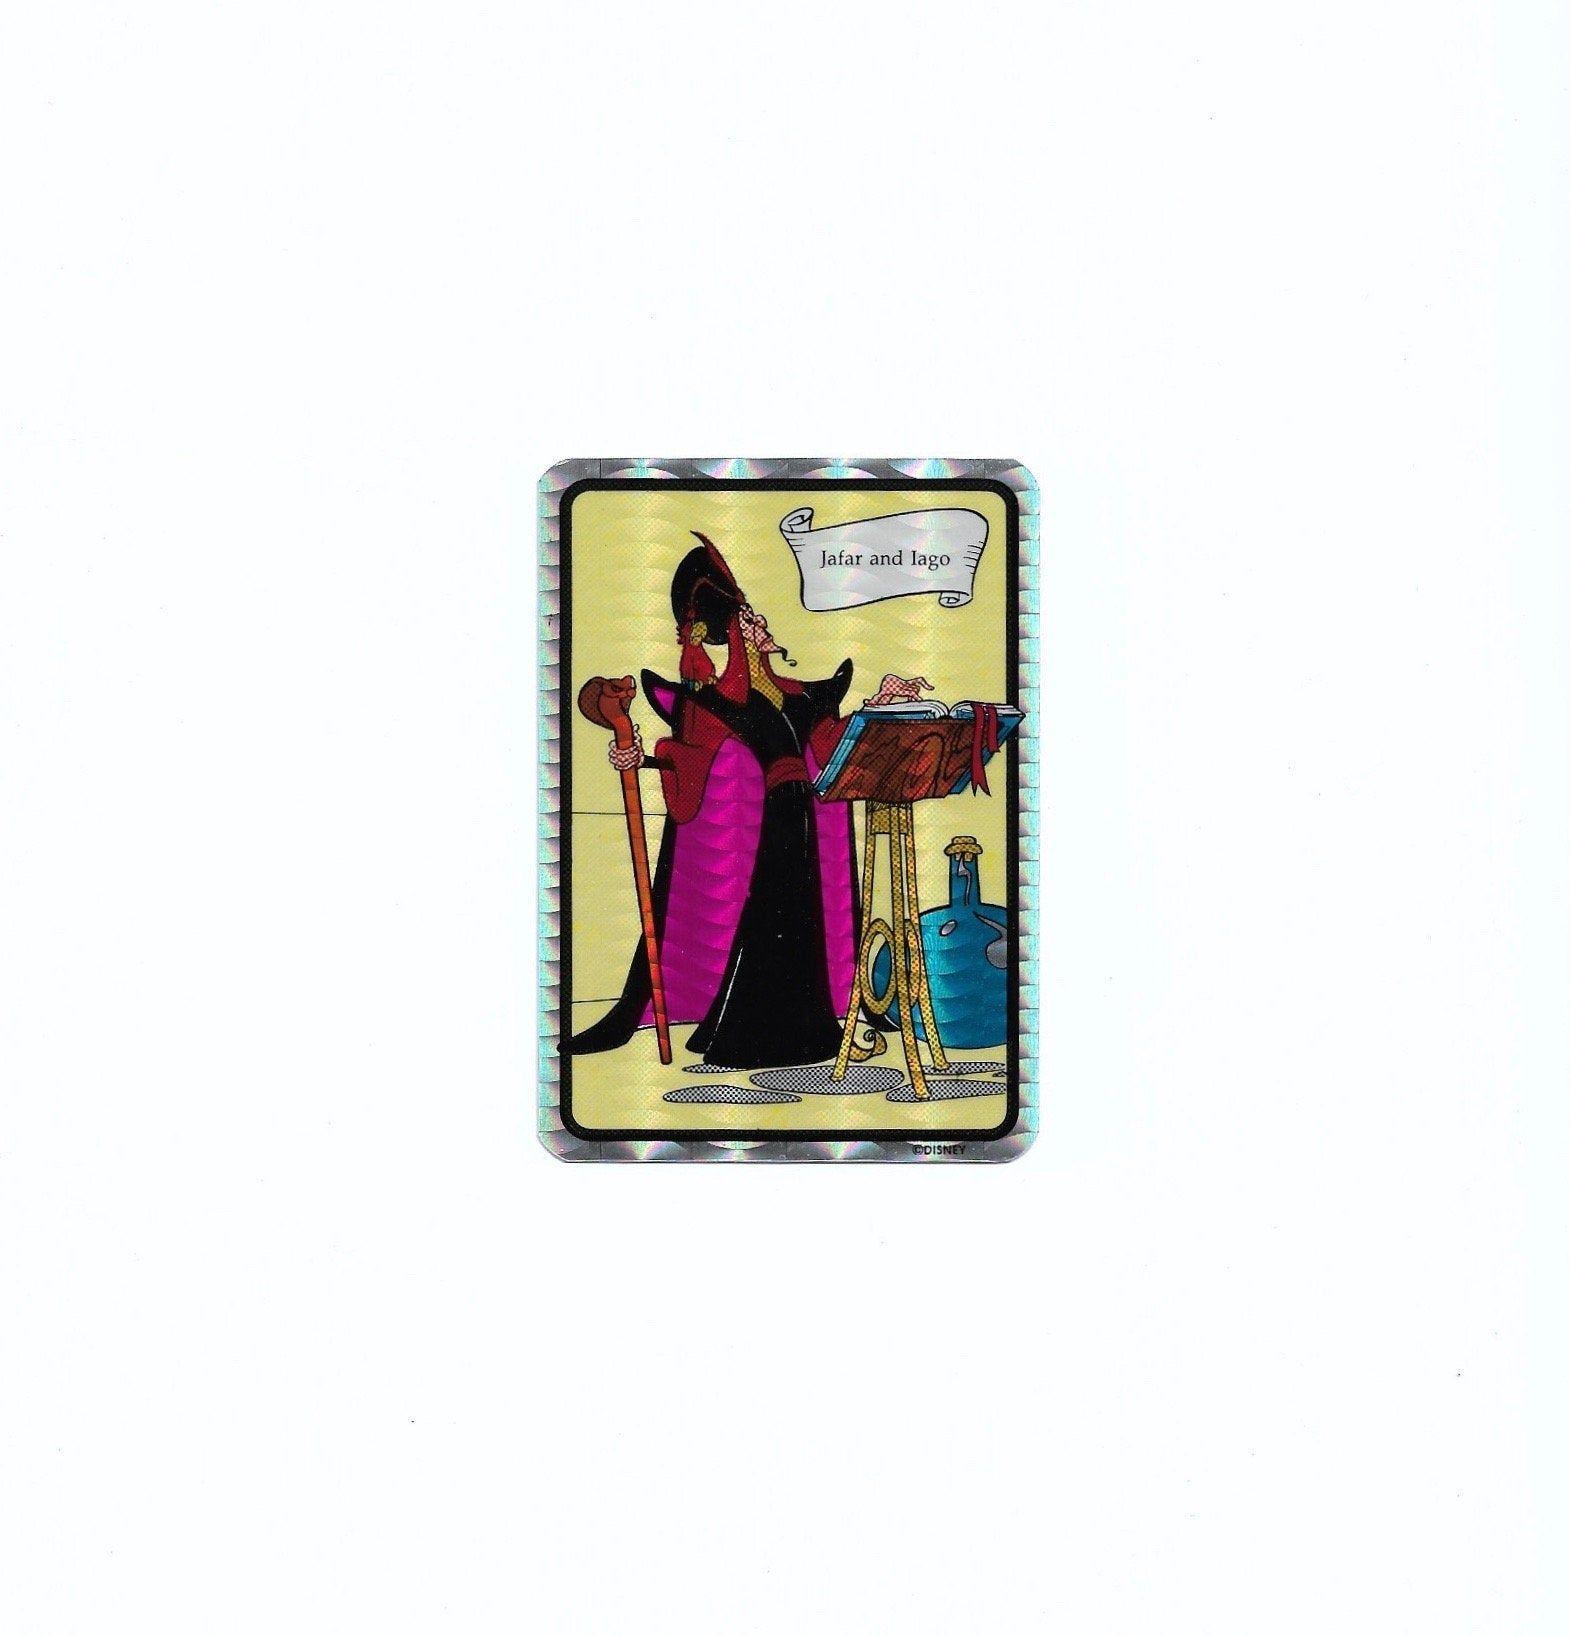 Vintage Aladdin Movie Sticker Prism Vending Decal Iago Jafar Animated Film 90s Holographic Cartoon Character 1992 Disn In 2021 Aladdin Movie Disney Gift Animation Film [ 1636 x 1570 Pixel ]